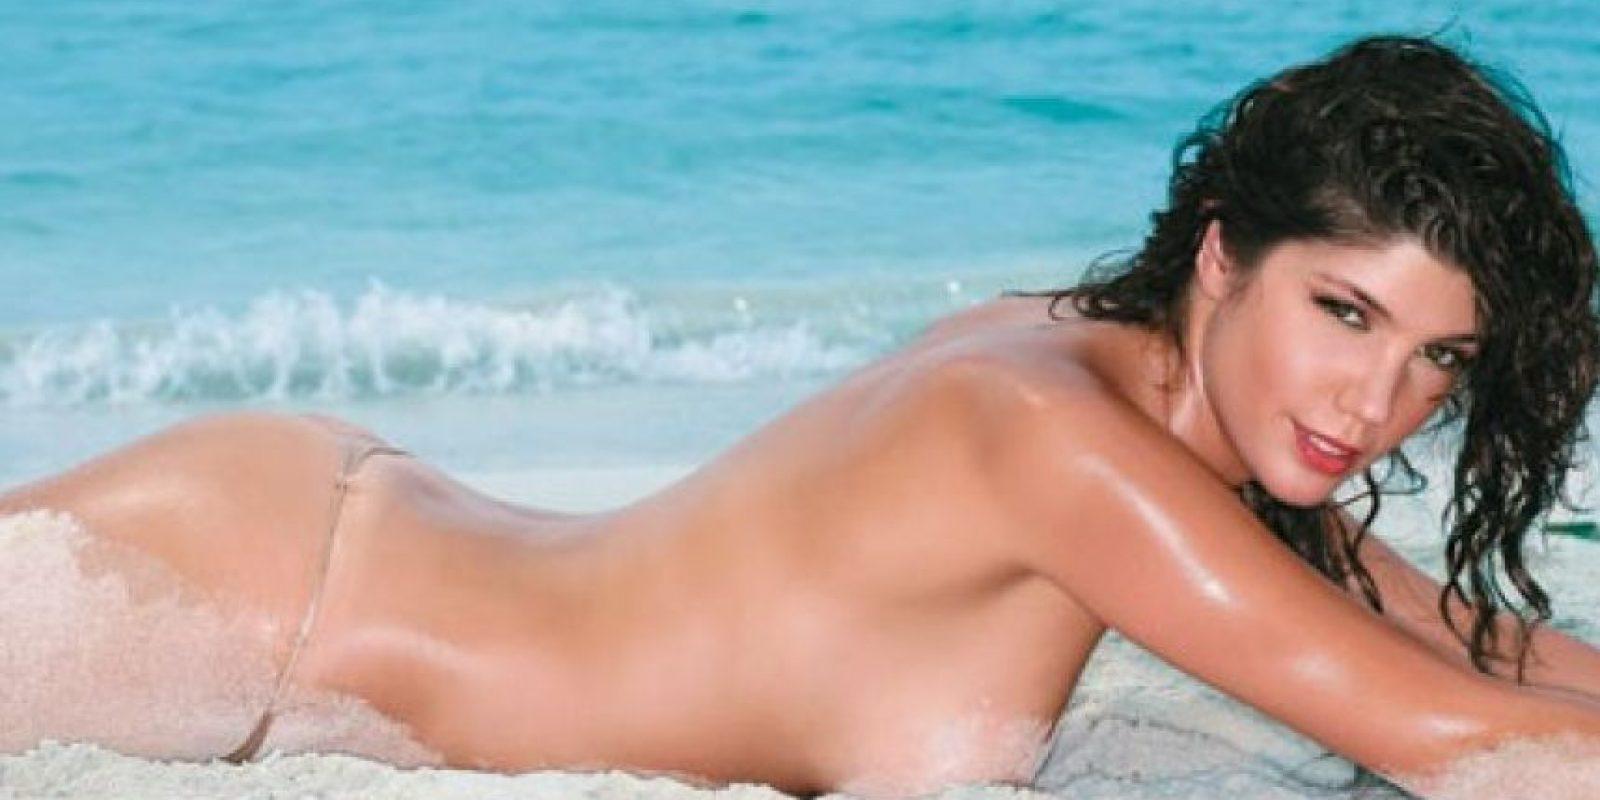 Andrea Jimenez Desnuda desnudas! así se mostraron estas osadas reinas de belleza